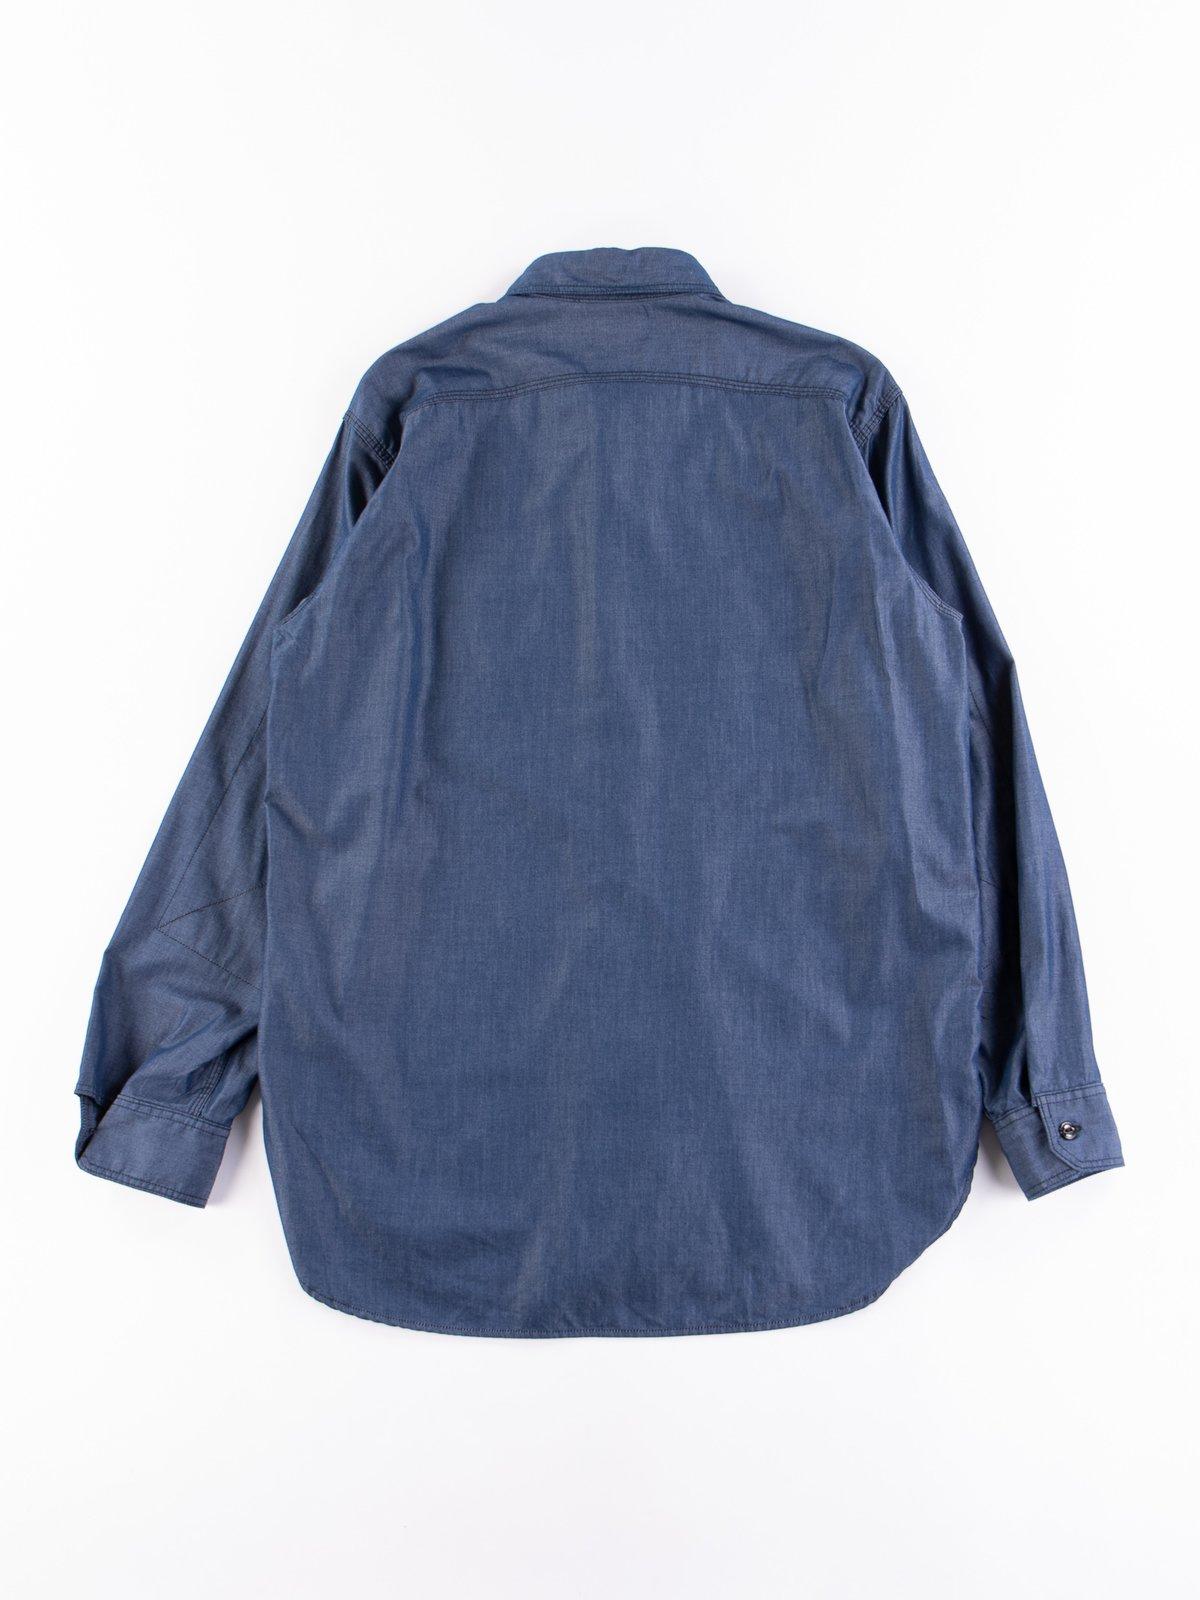 Dark Blue Light Weight Denim Work Shirt - Image 5